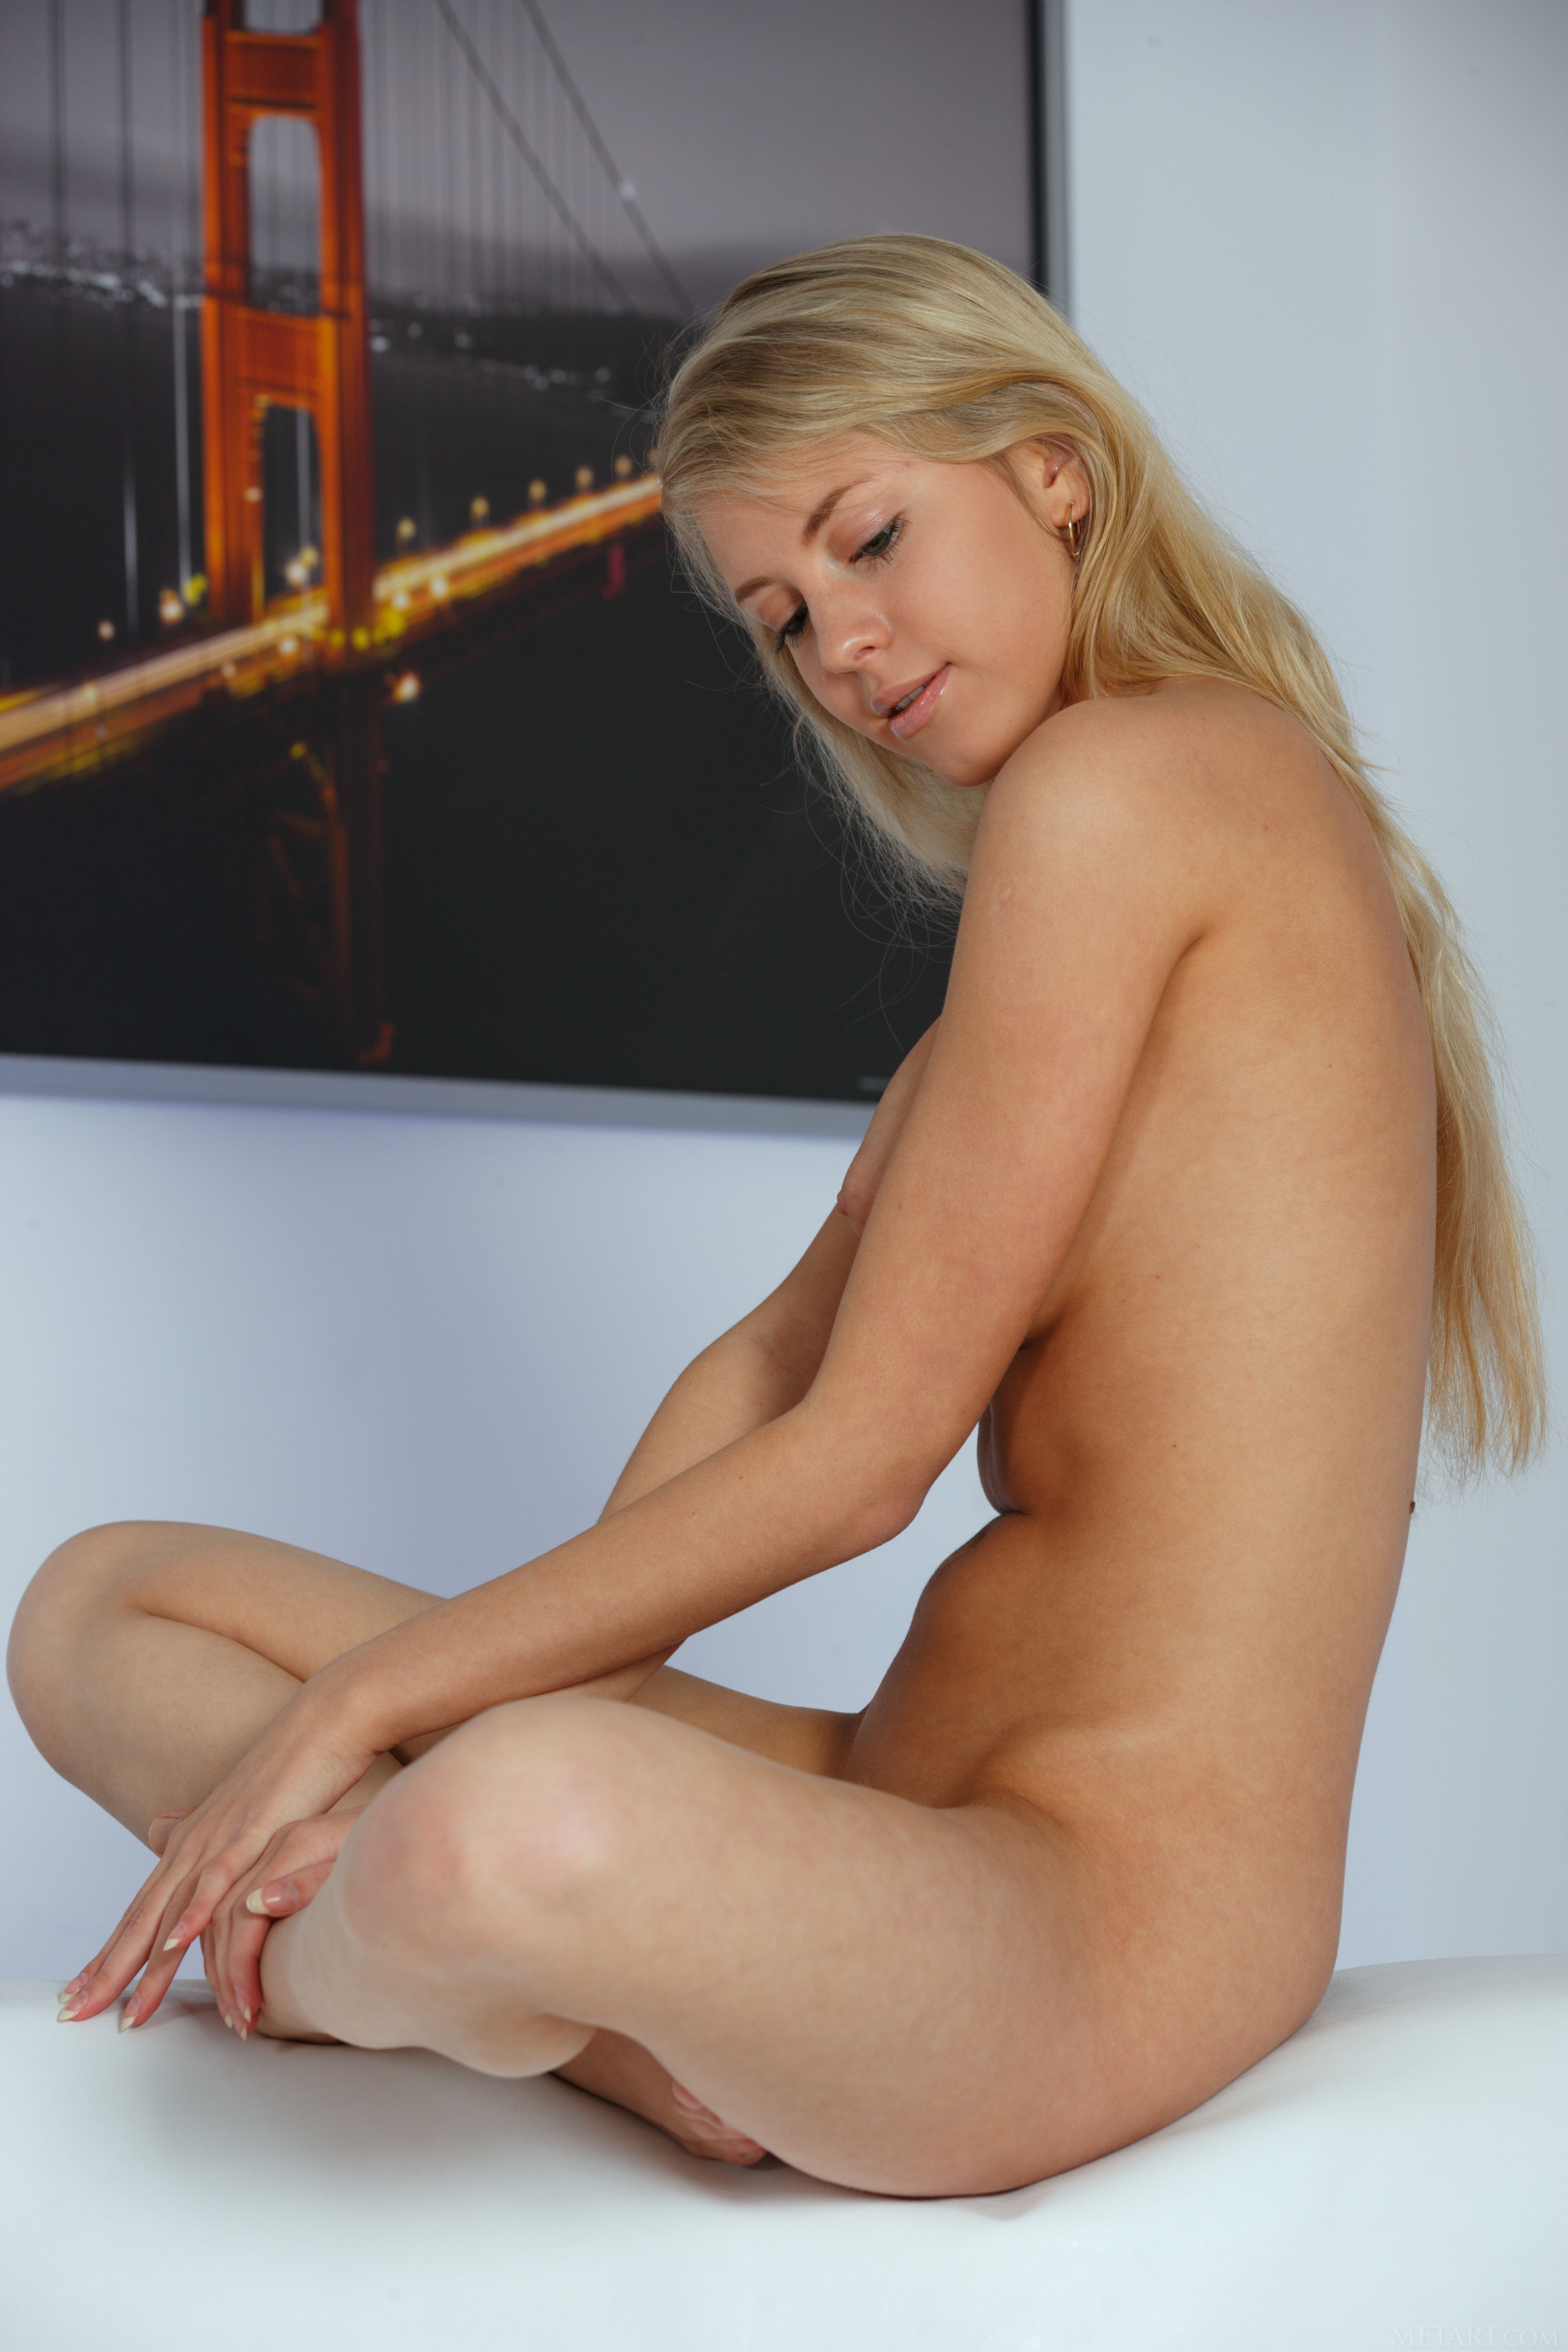 turboimagehost.com imagesize:960x1440piss porn d